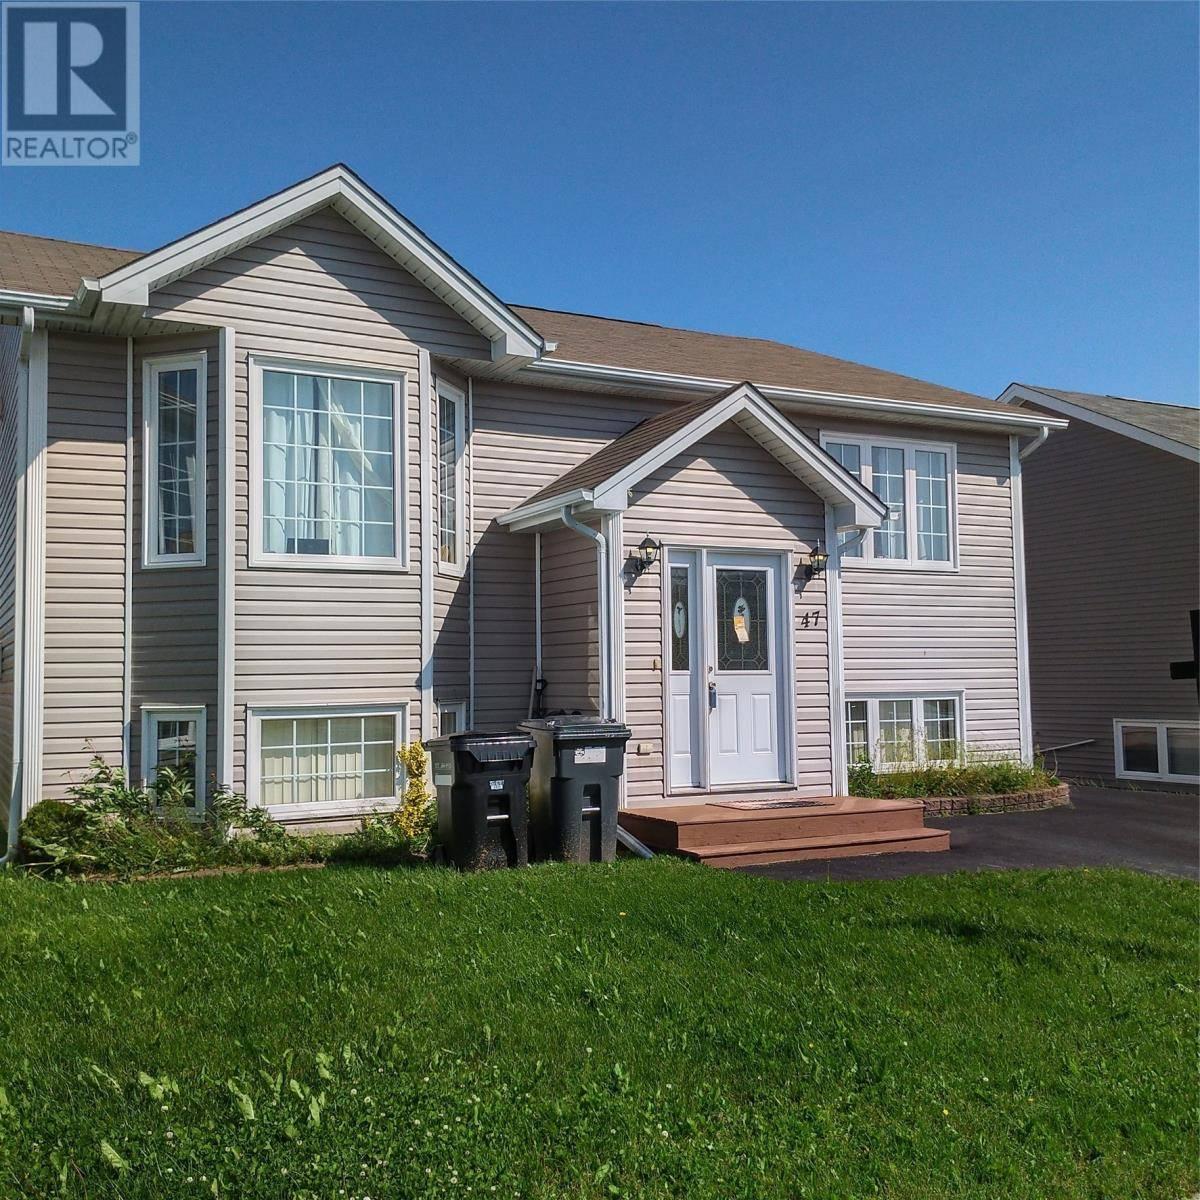 House for sale at 47 Otter Dr St. John's Newfoundland - MLS: 1197209